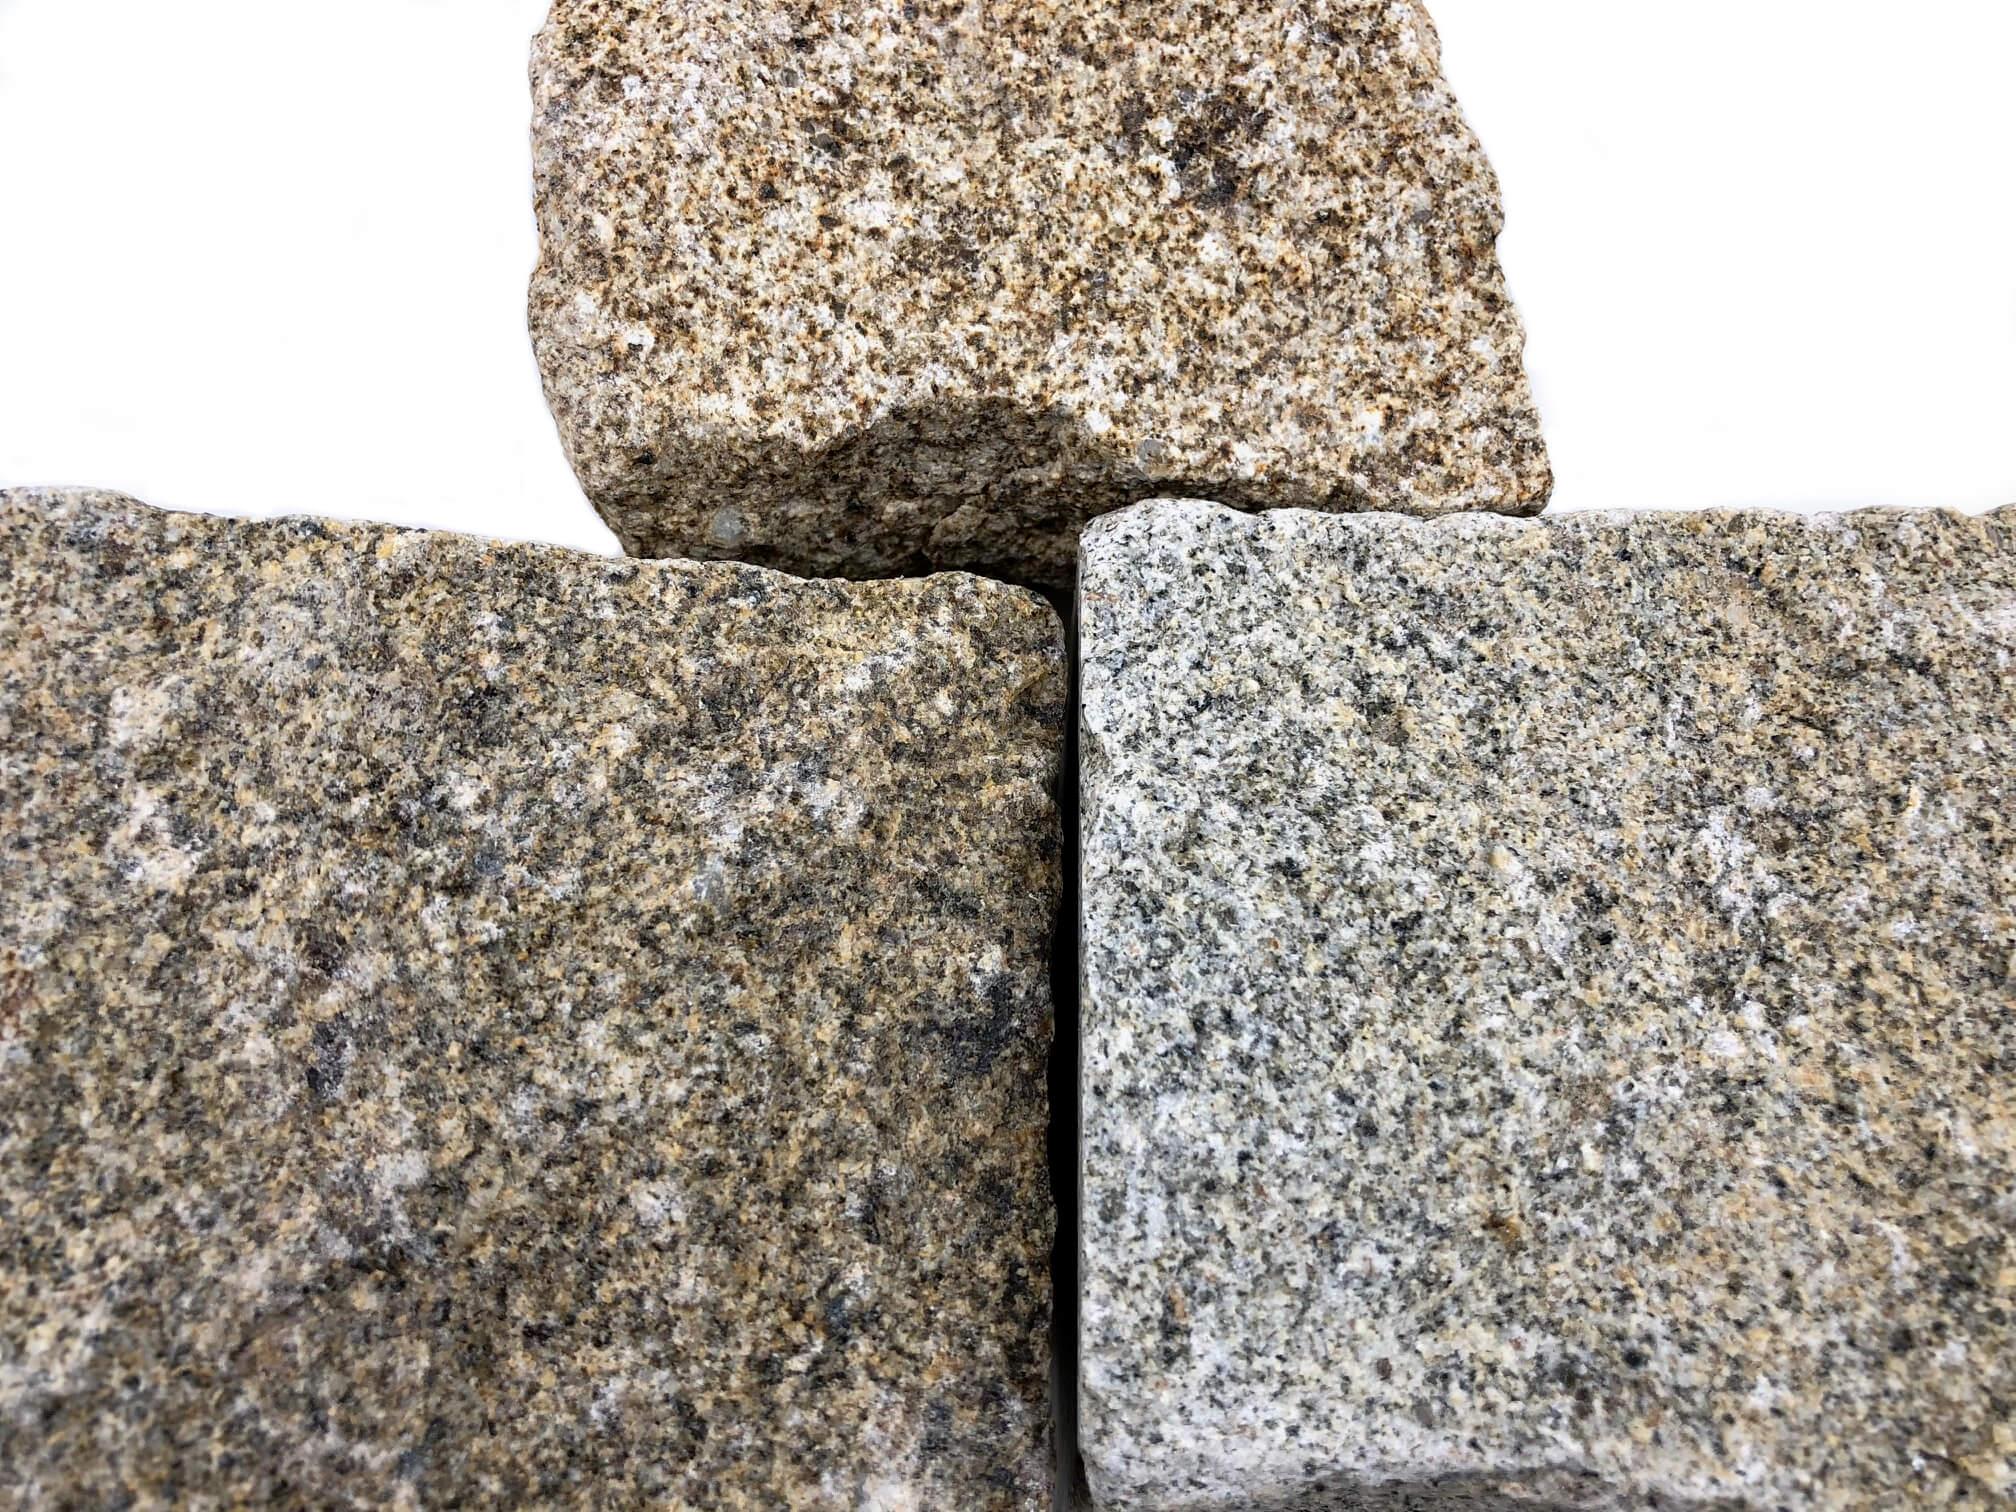 granit-kleinpflaster-neu-gelb-grau-8-11cm-box73(2)